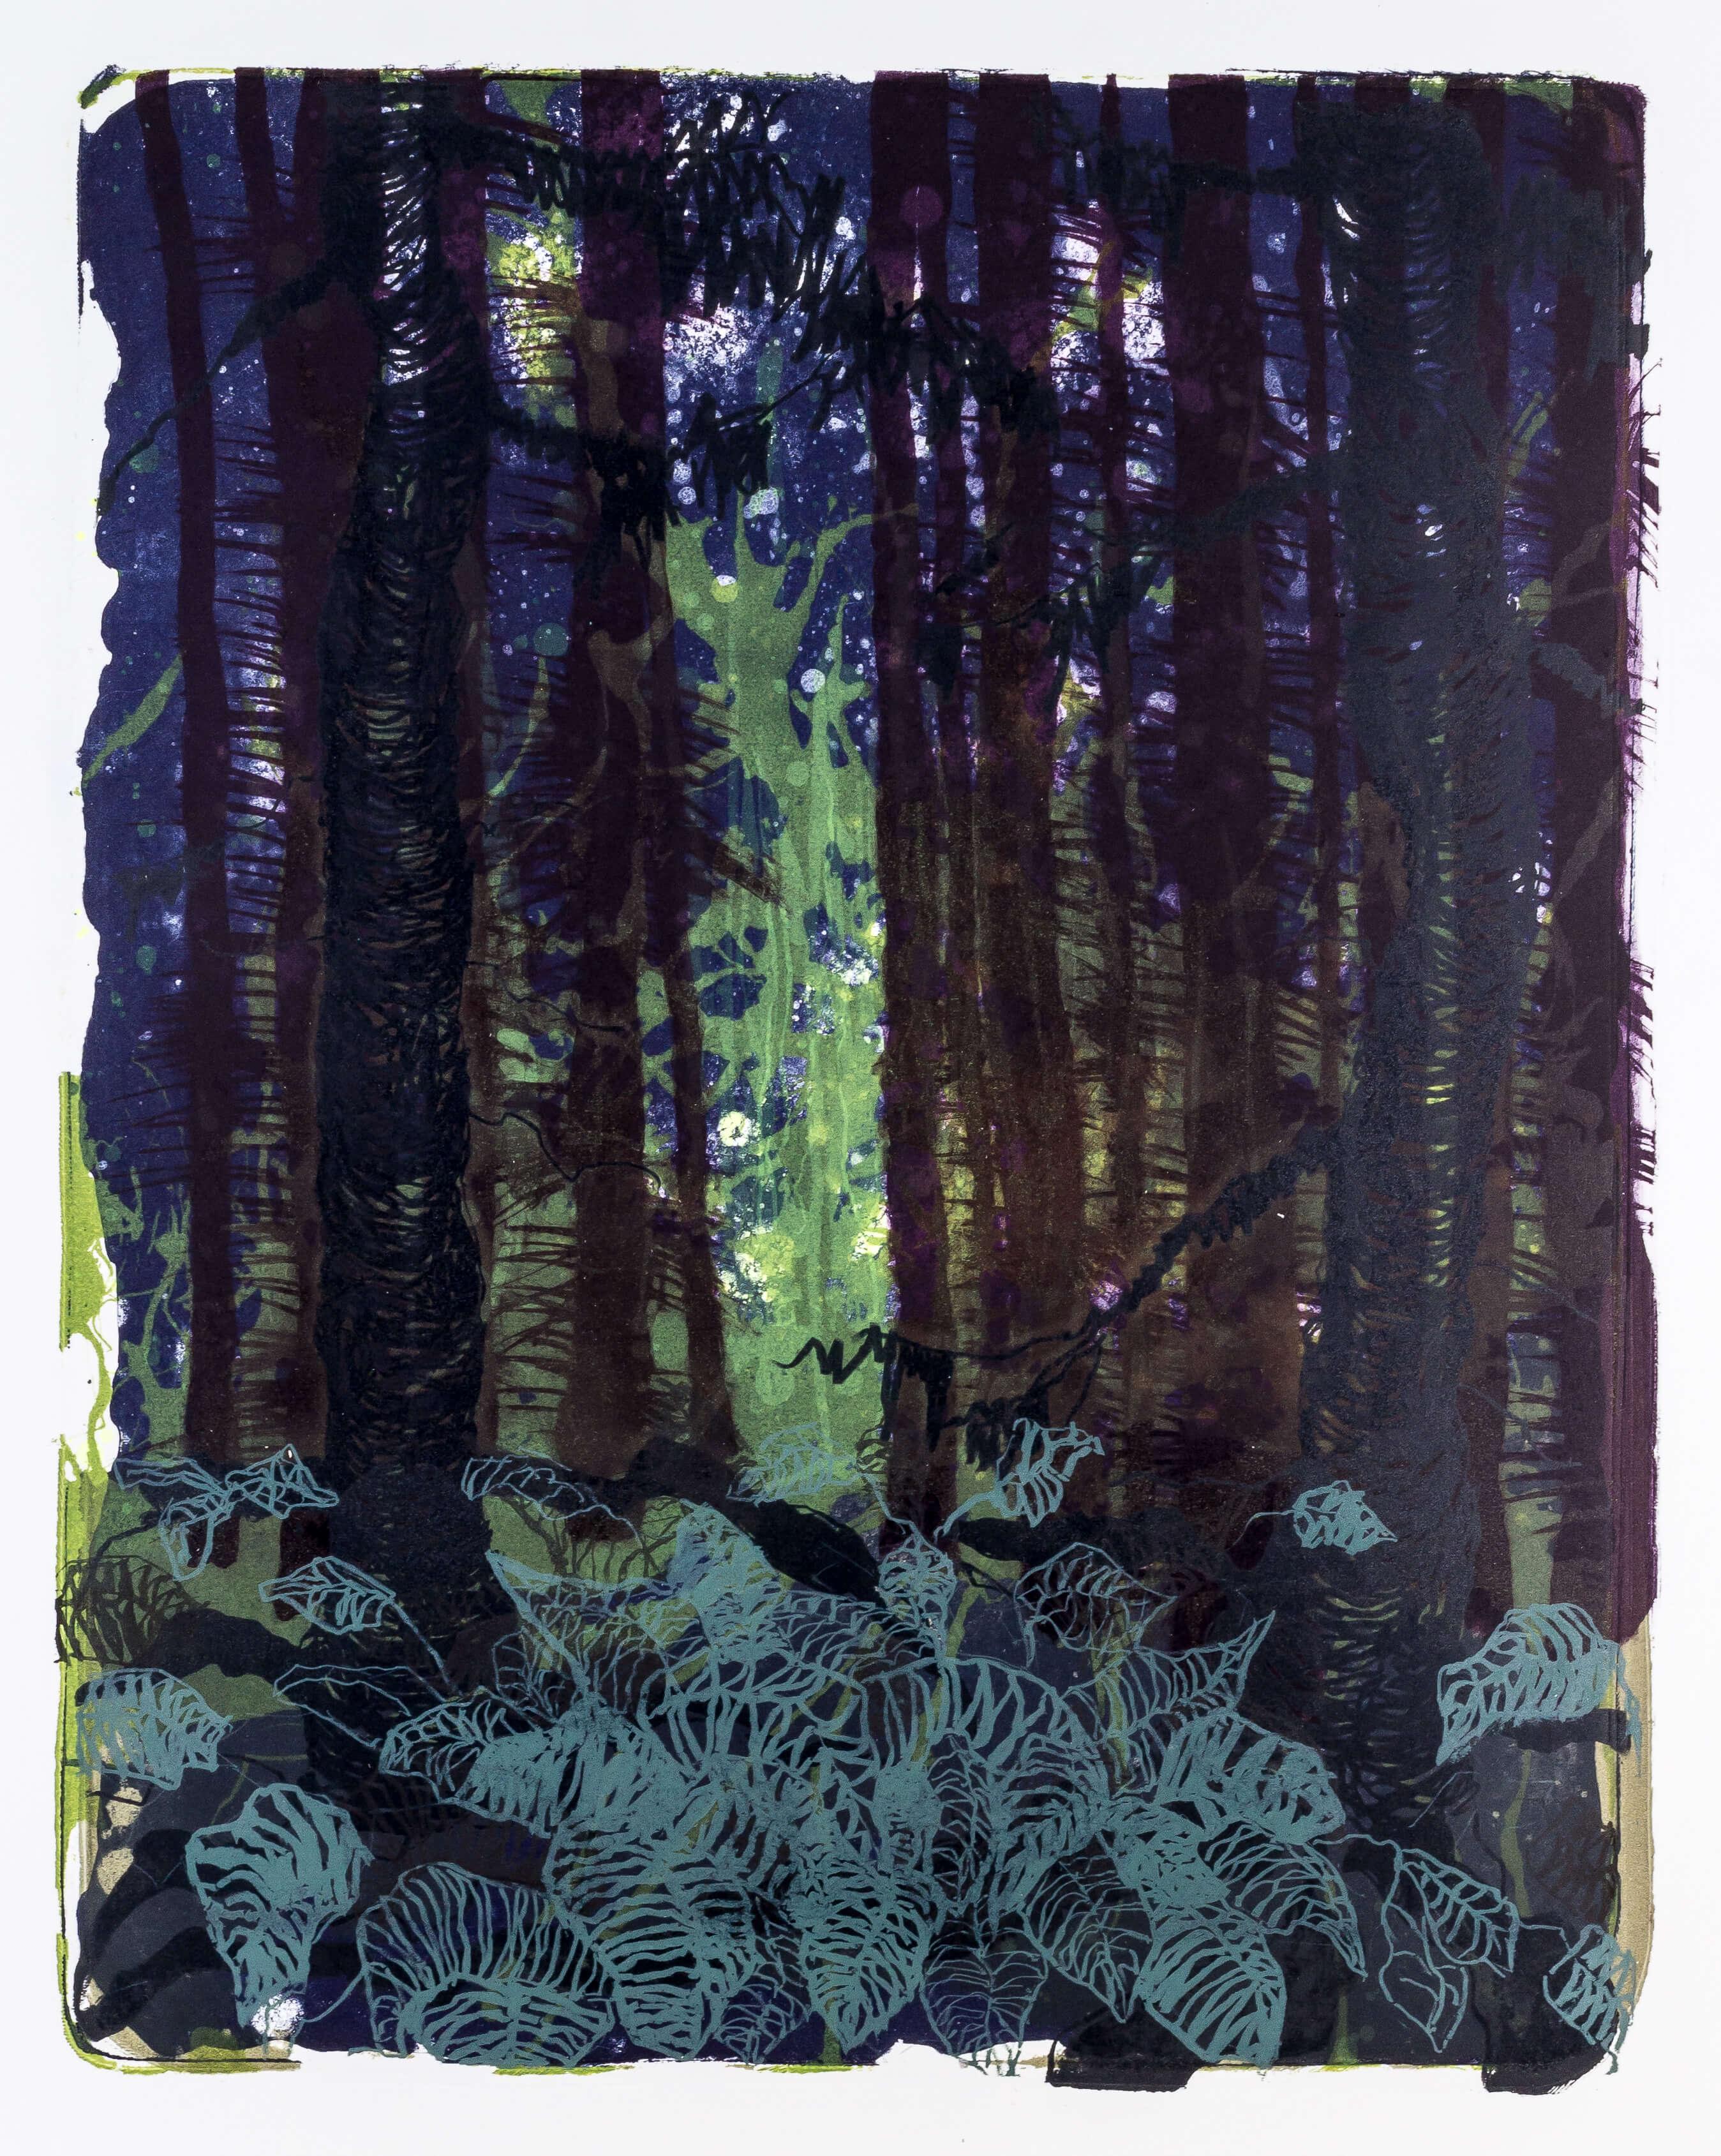 Katharina Albers, Wald X-XXIX, 2015, Farblithographie, Unikat, 50×40 cm